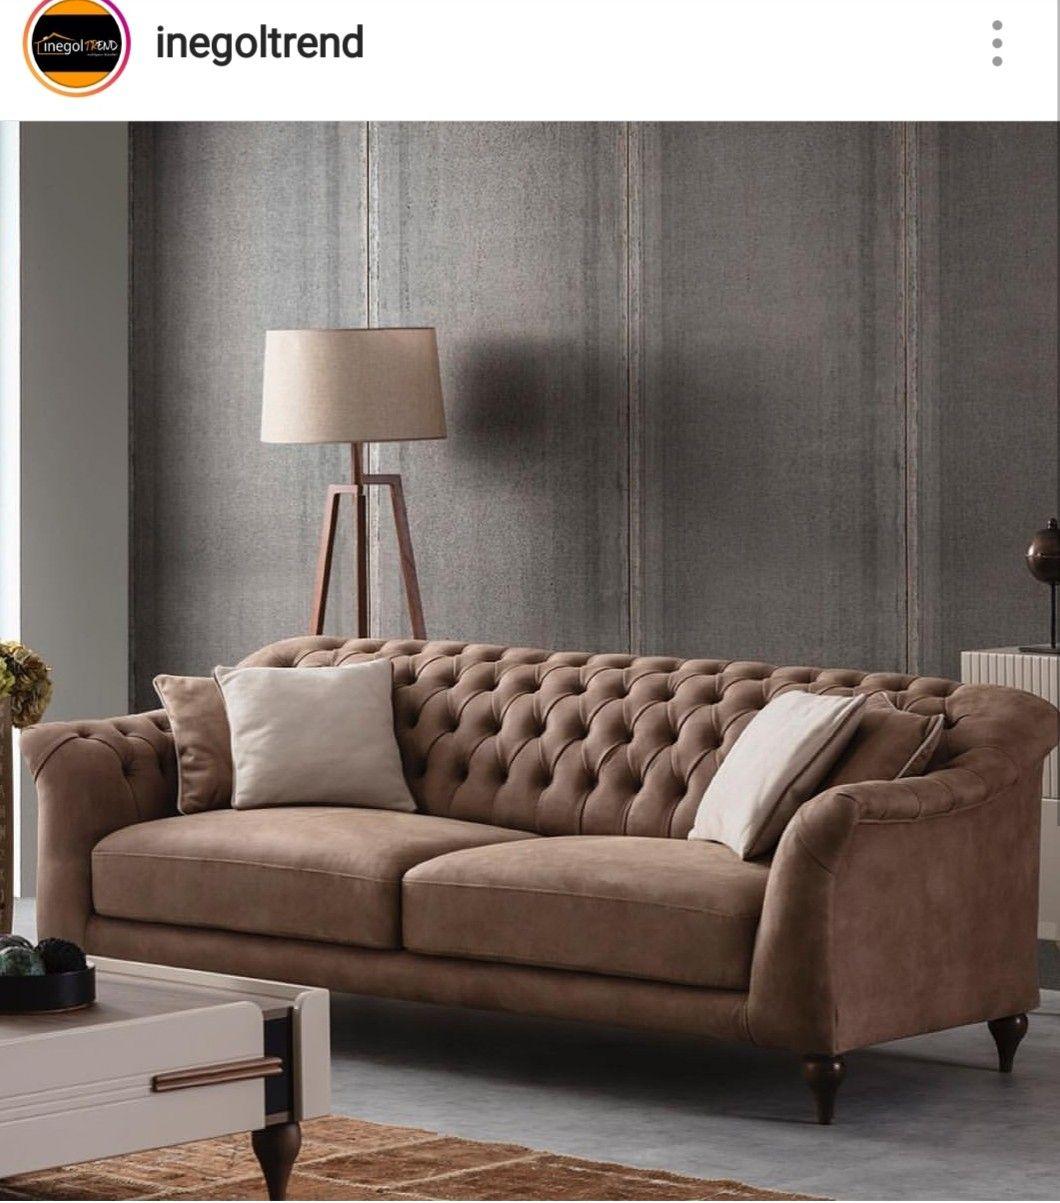 Milano Koltuk Takimi Furniture Sofa Home Decor